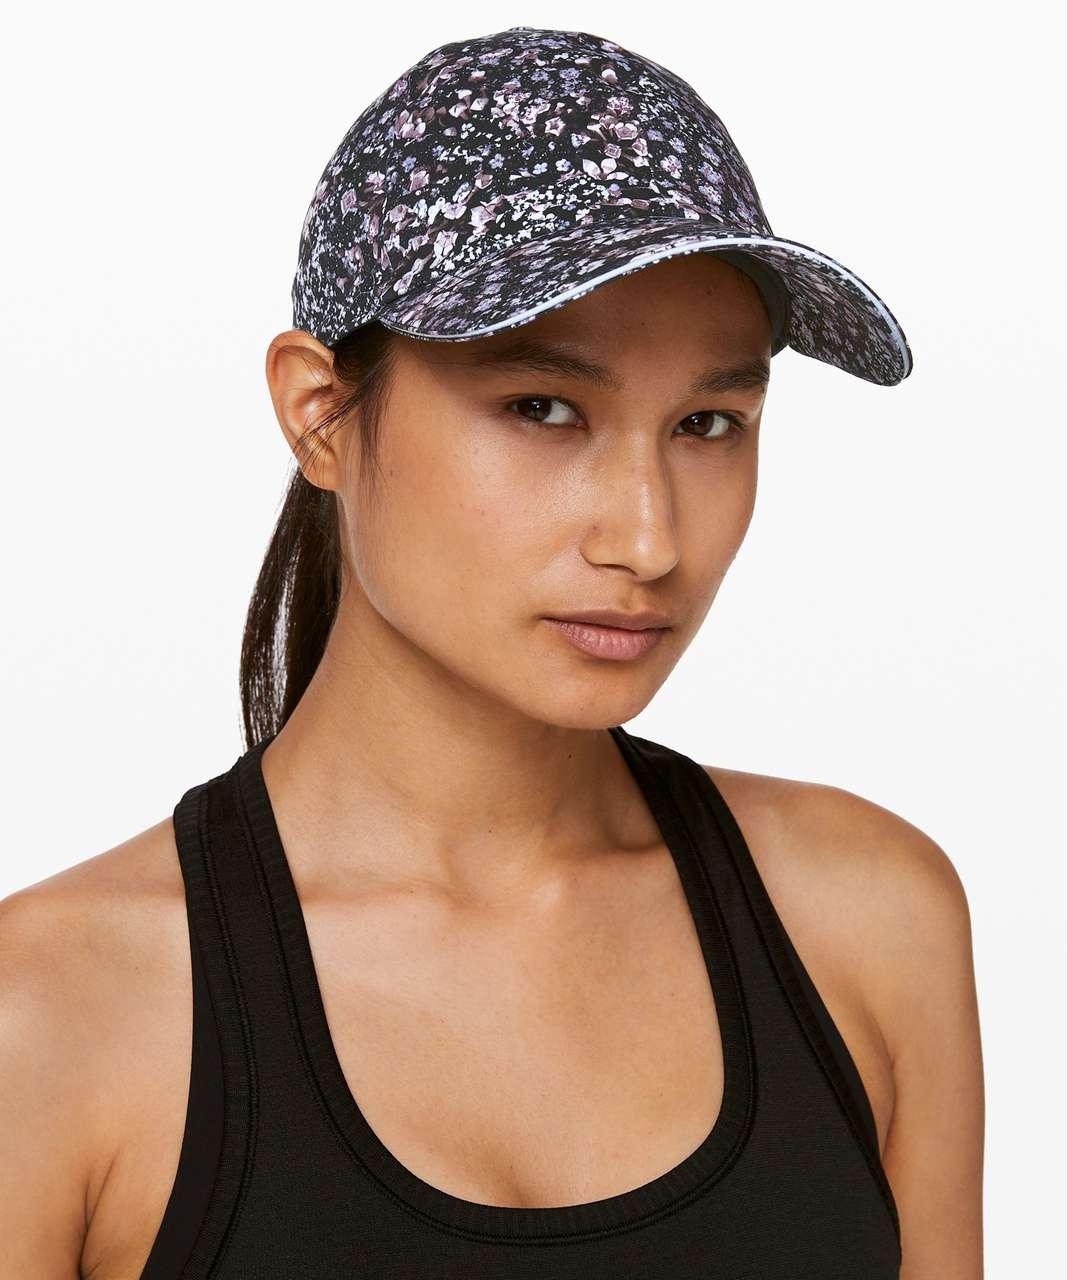 89374c7e Lululemon Baller Hat Run *Ponytail - Floral Spritz Multi - lulu fanatics